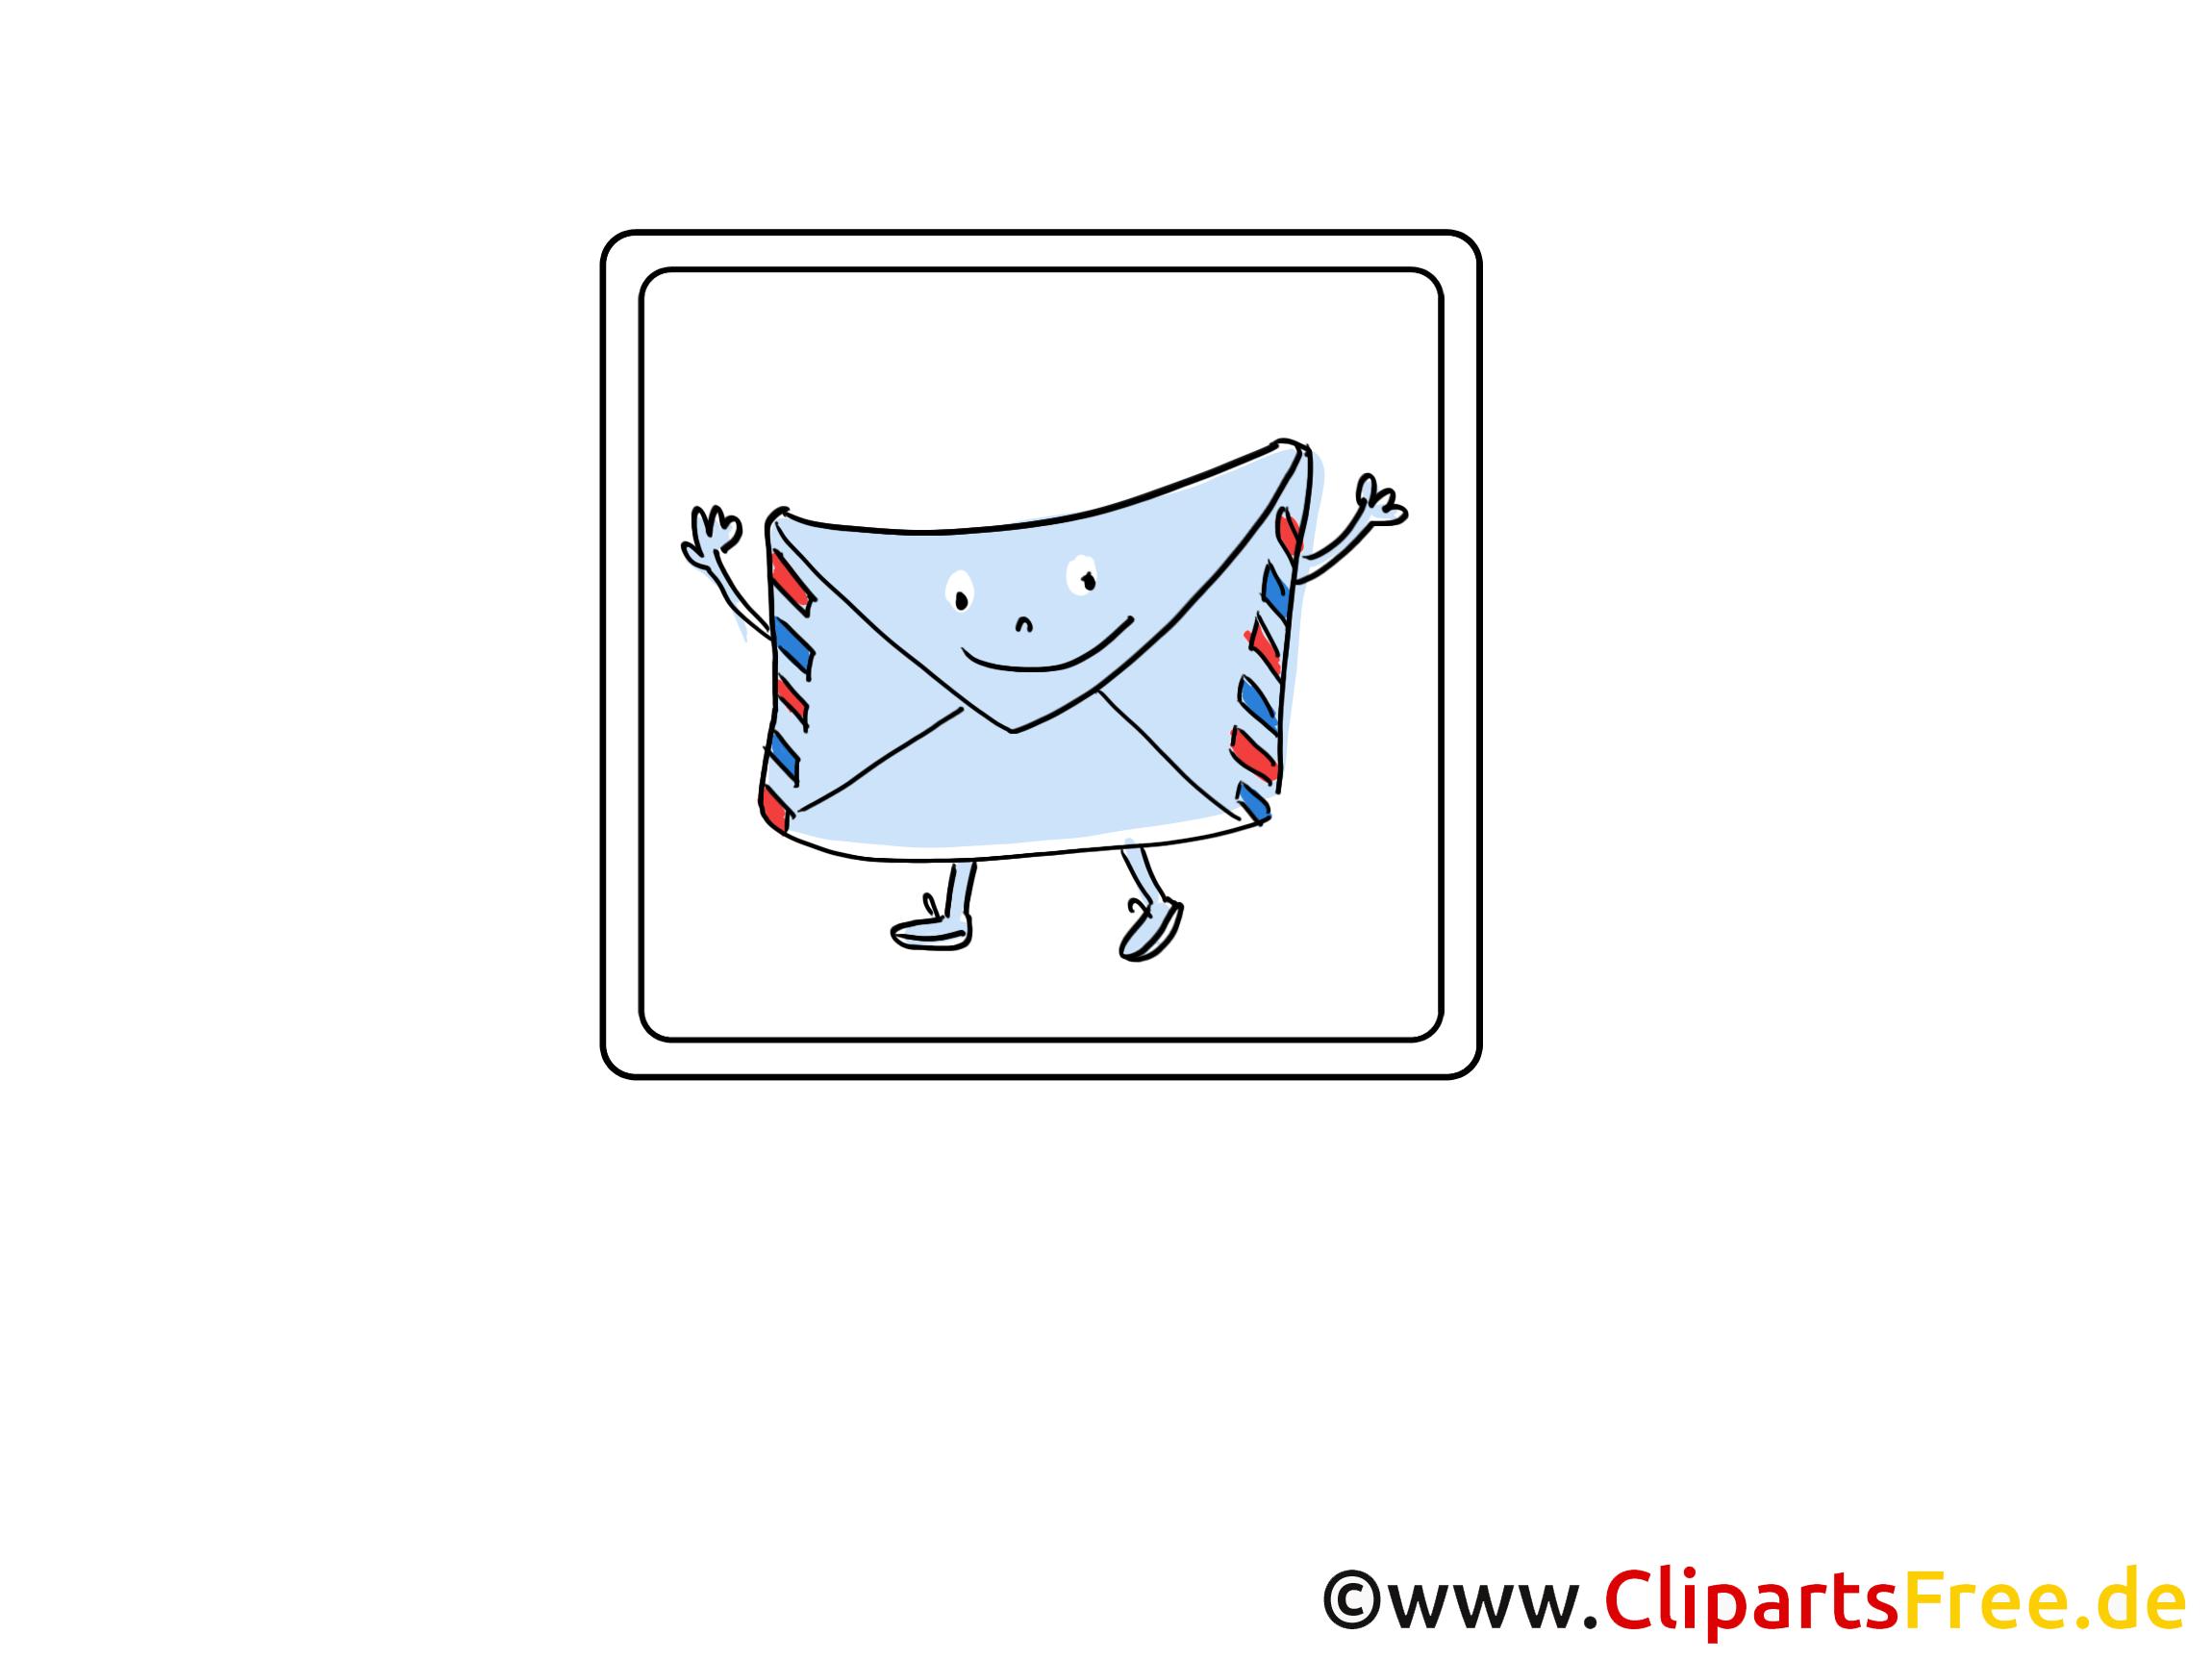 Lettre image gratuite - Icône illustration